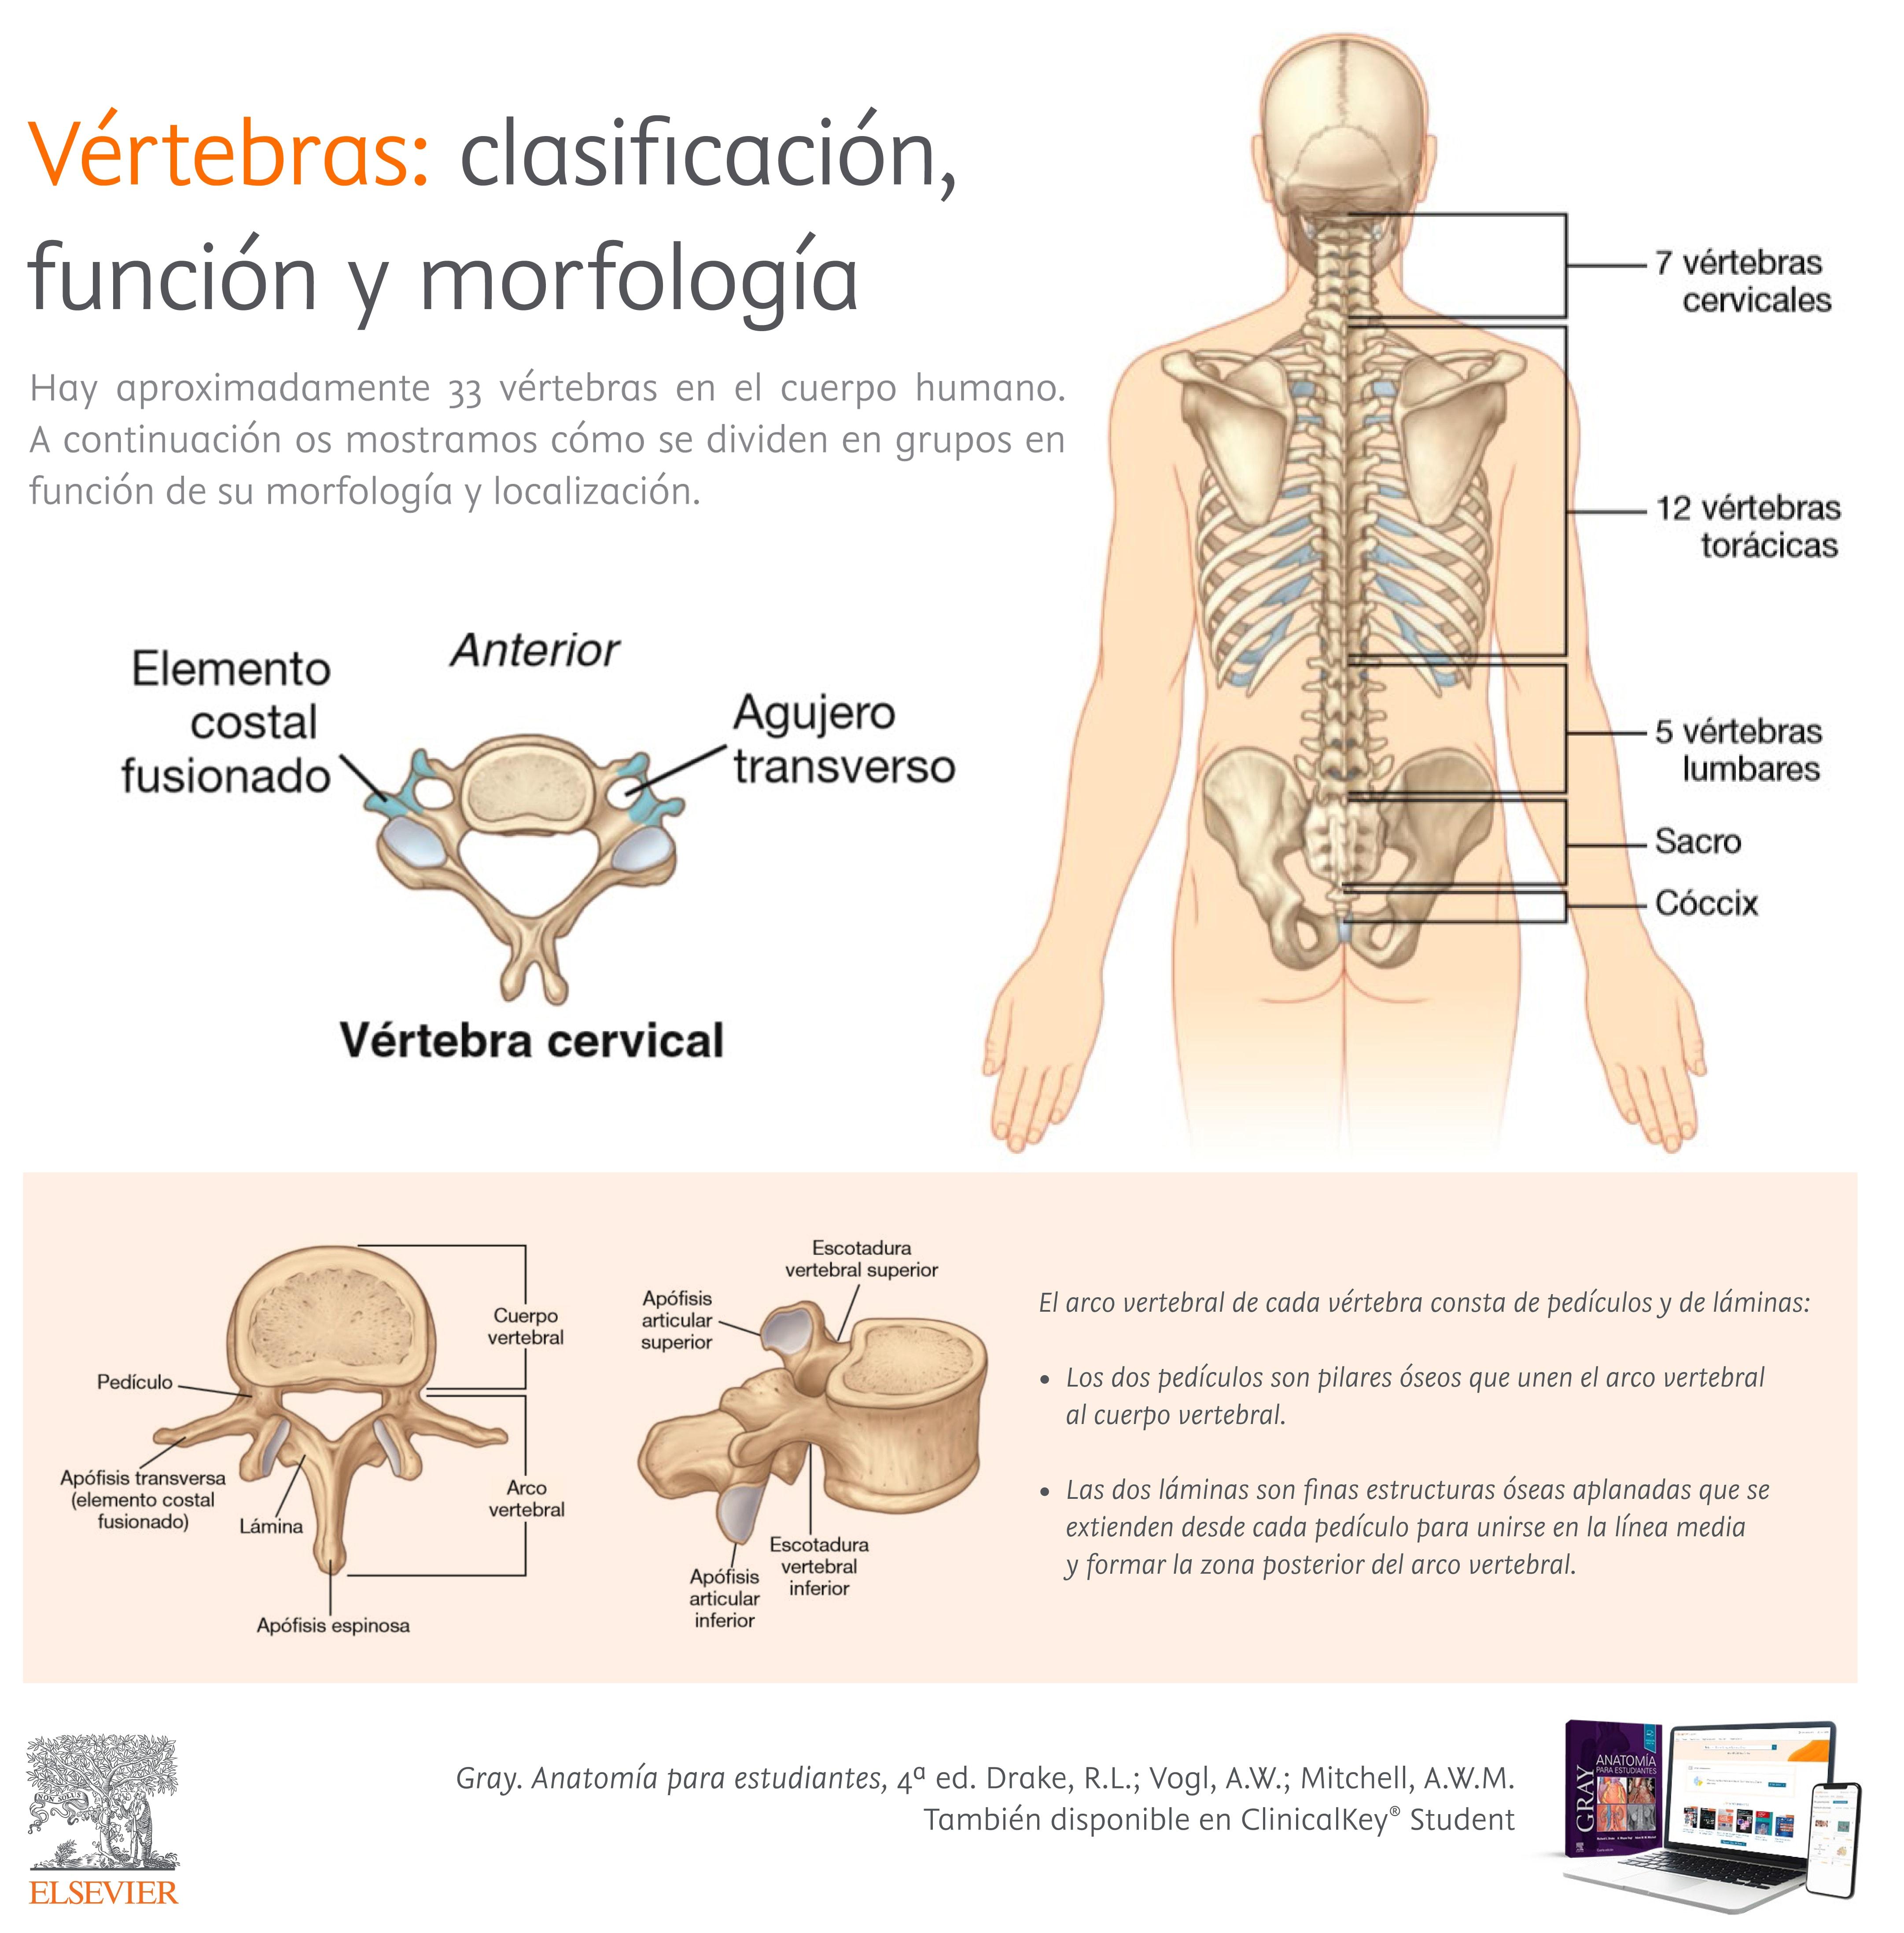 1-InfografiaVertebras-clasificacion-funcion-morfologia.jpg